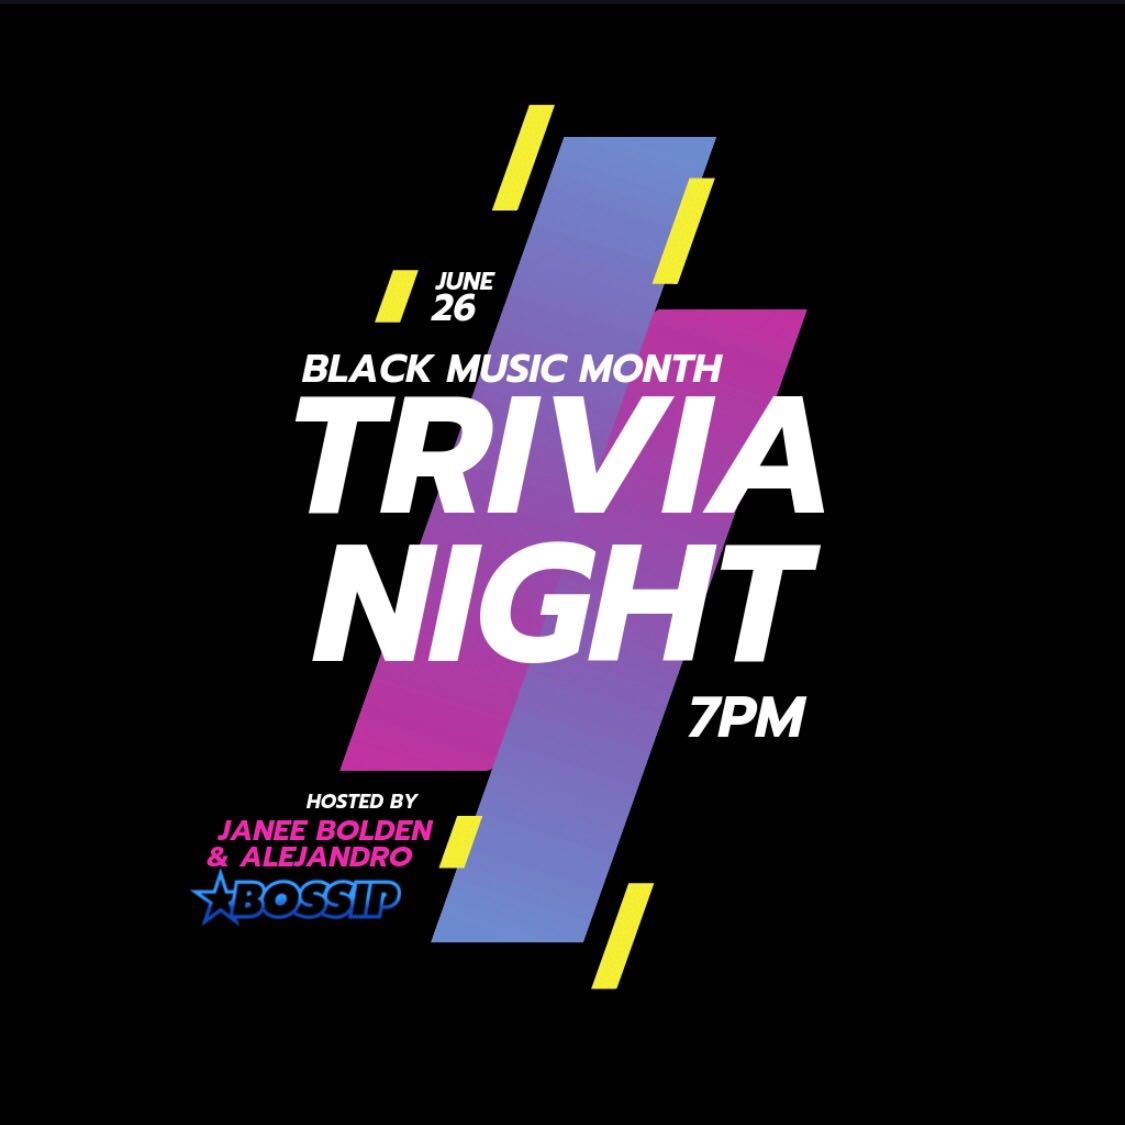 Black Music Month Trivia Night